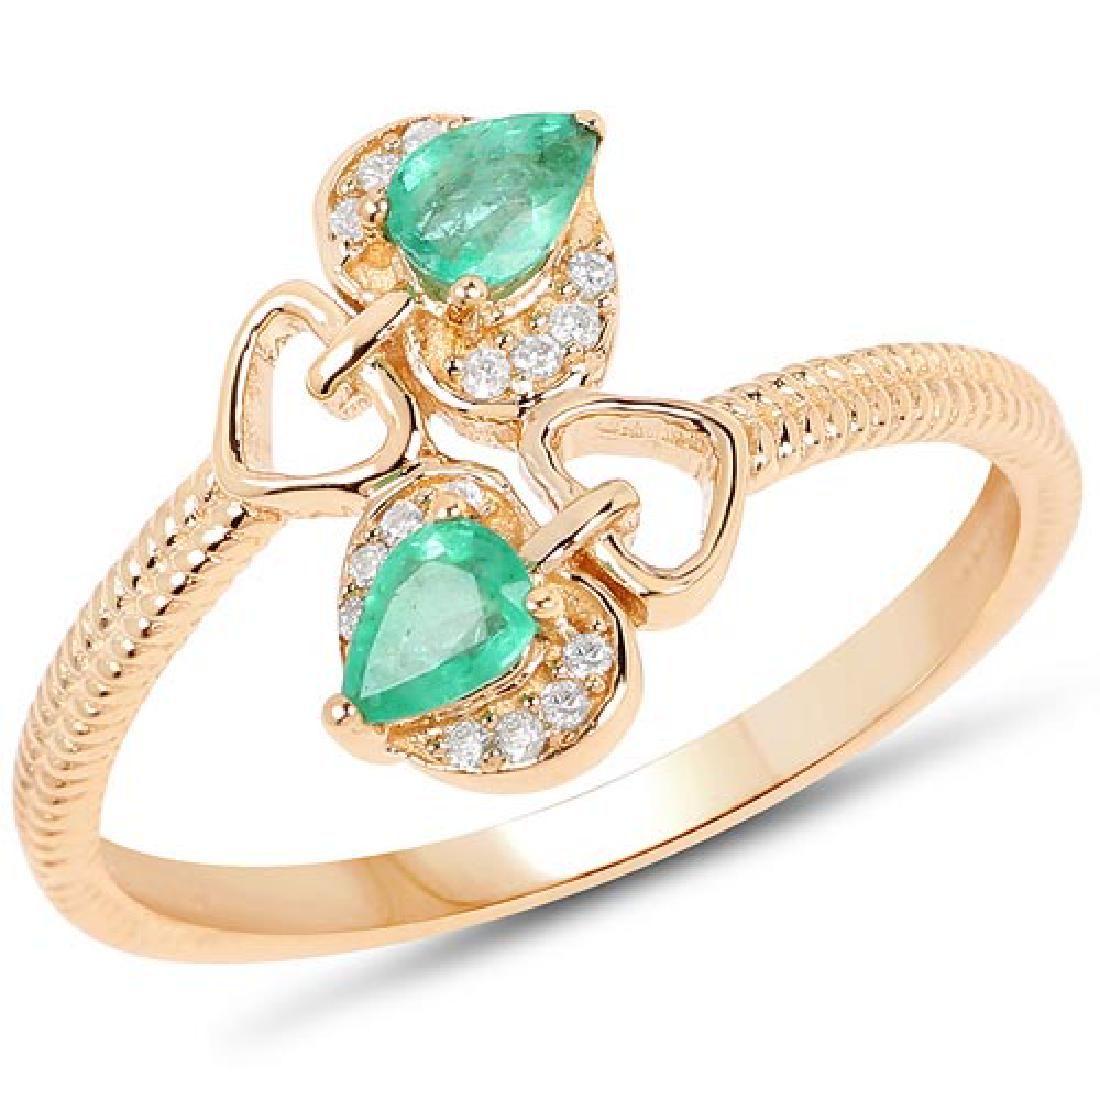 033 CTW Genuine Zambian Emerald and White Diamond 14K